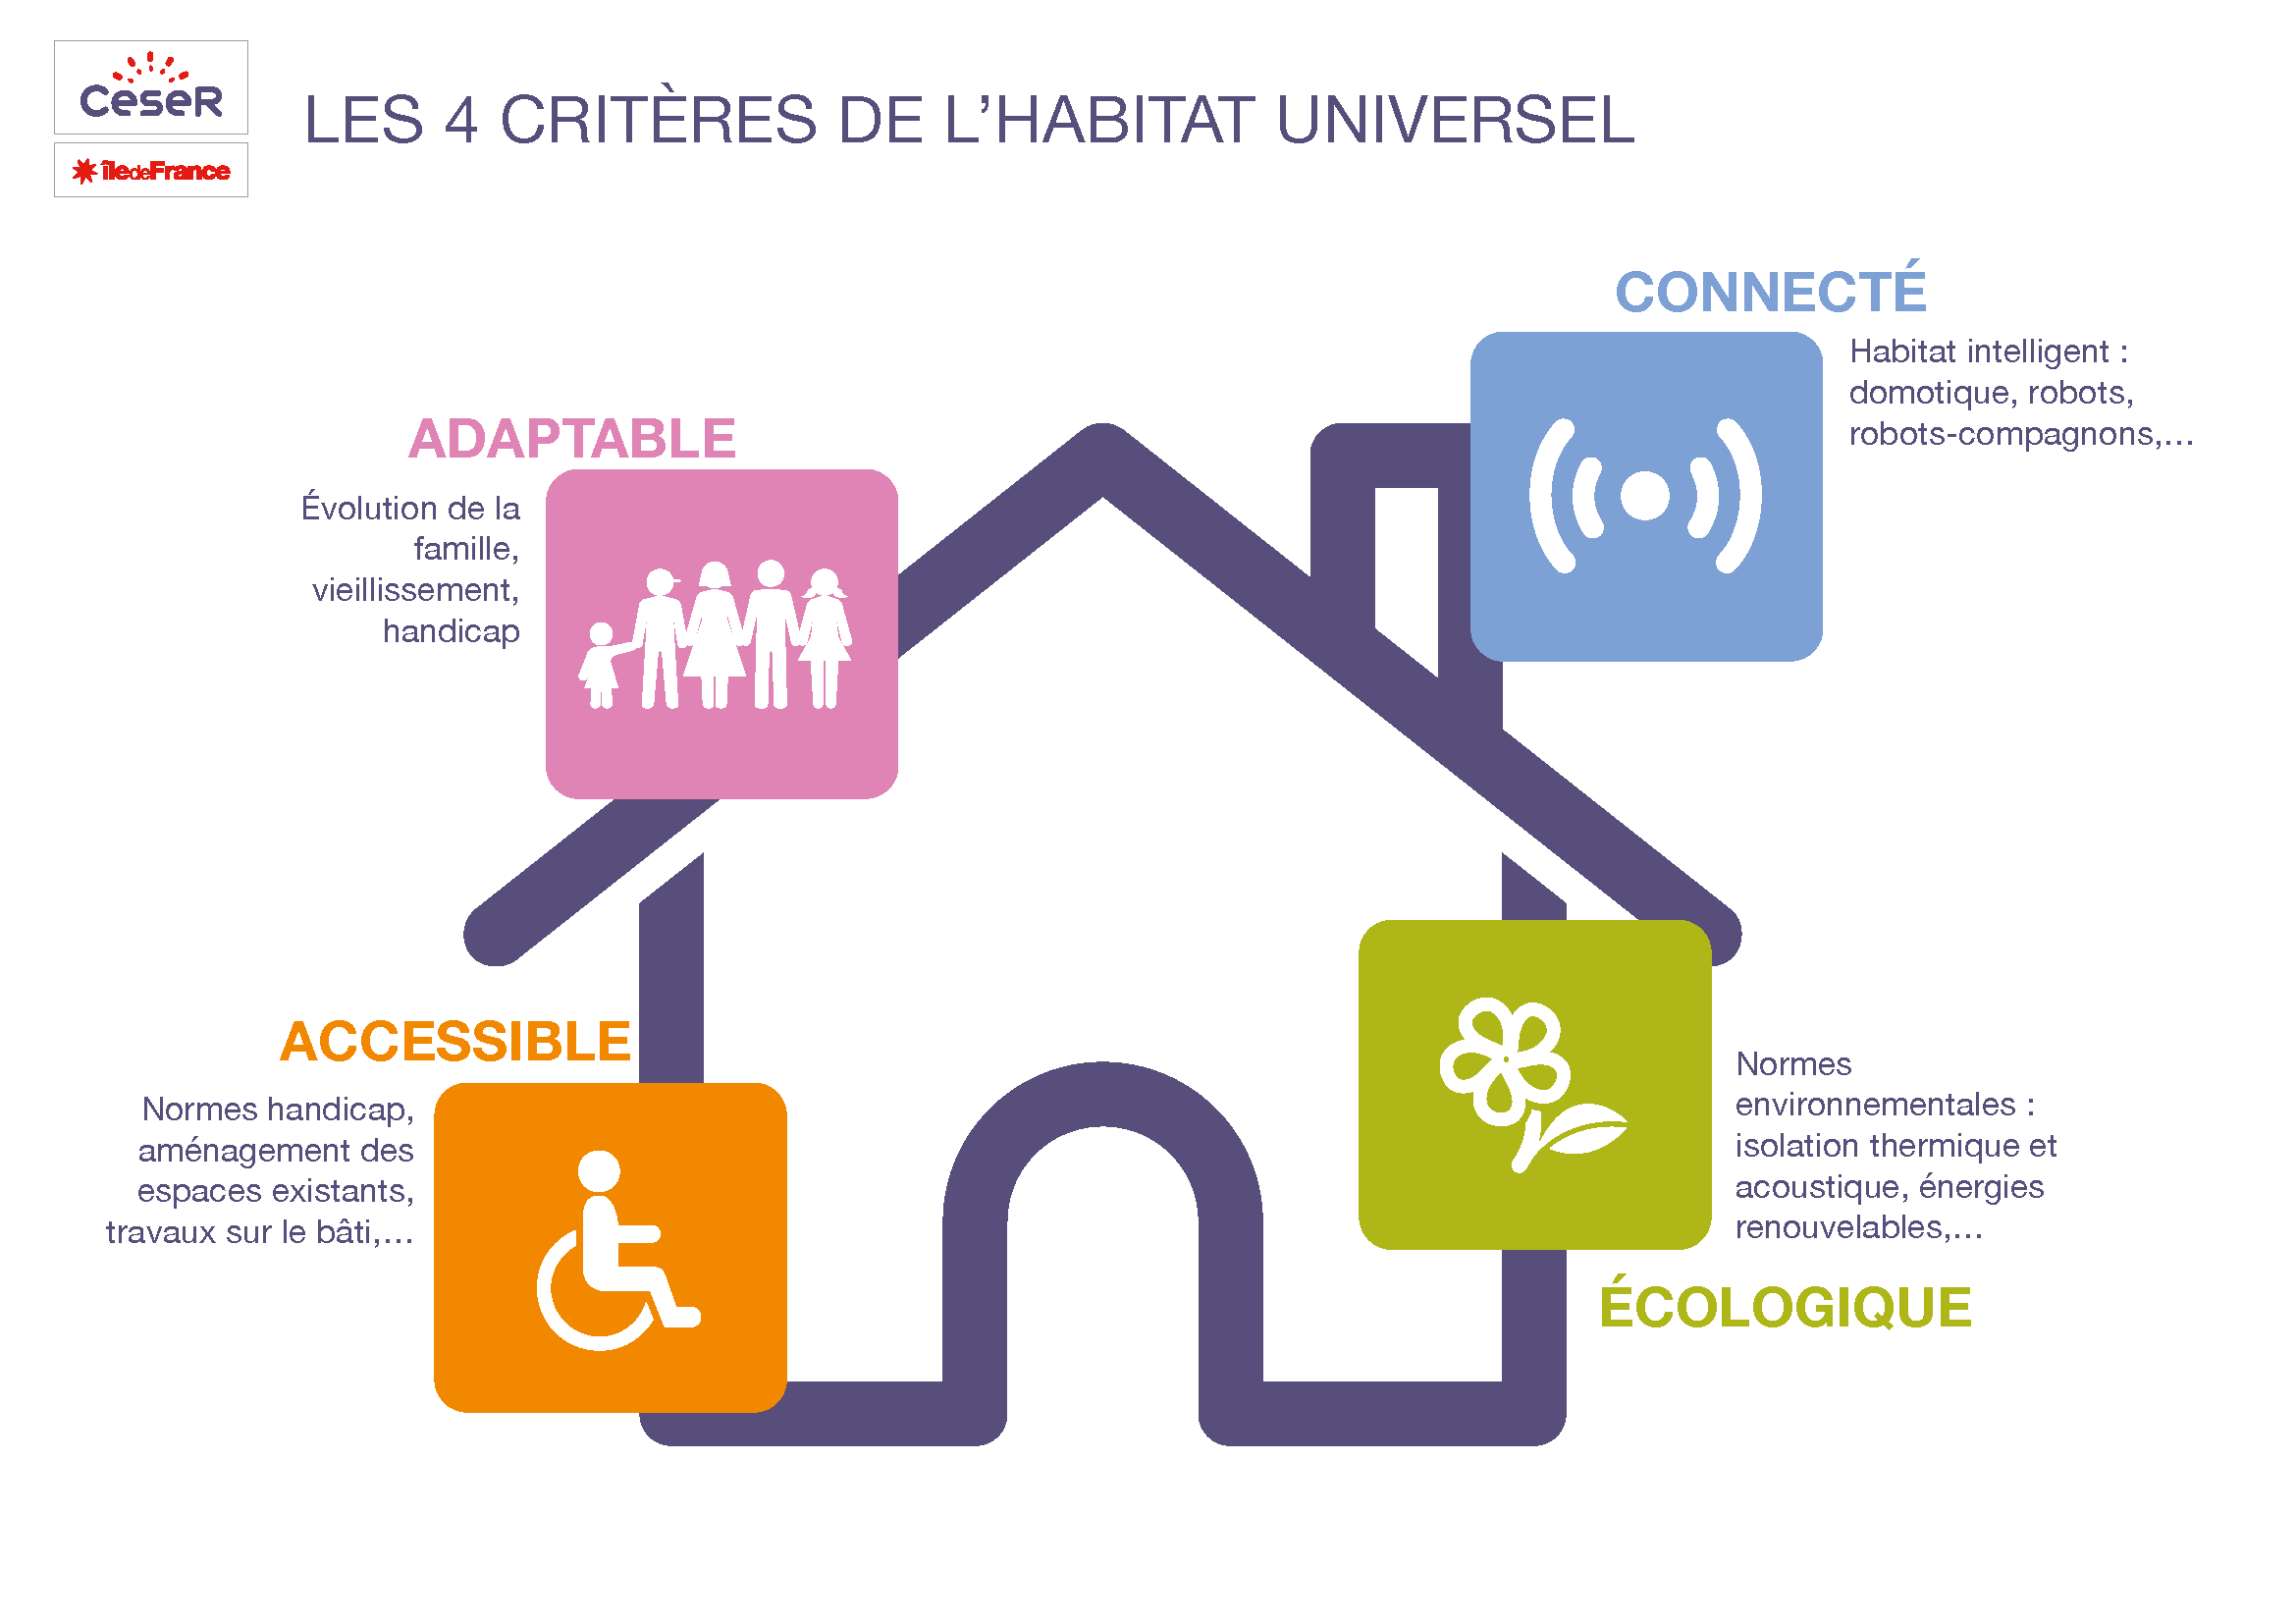 infog_habitat_universel_ceseridf_dec2017.png